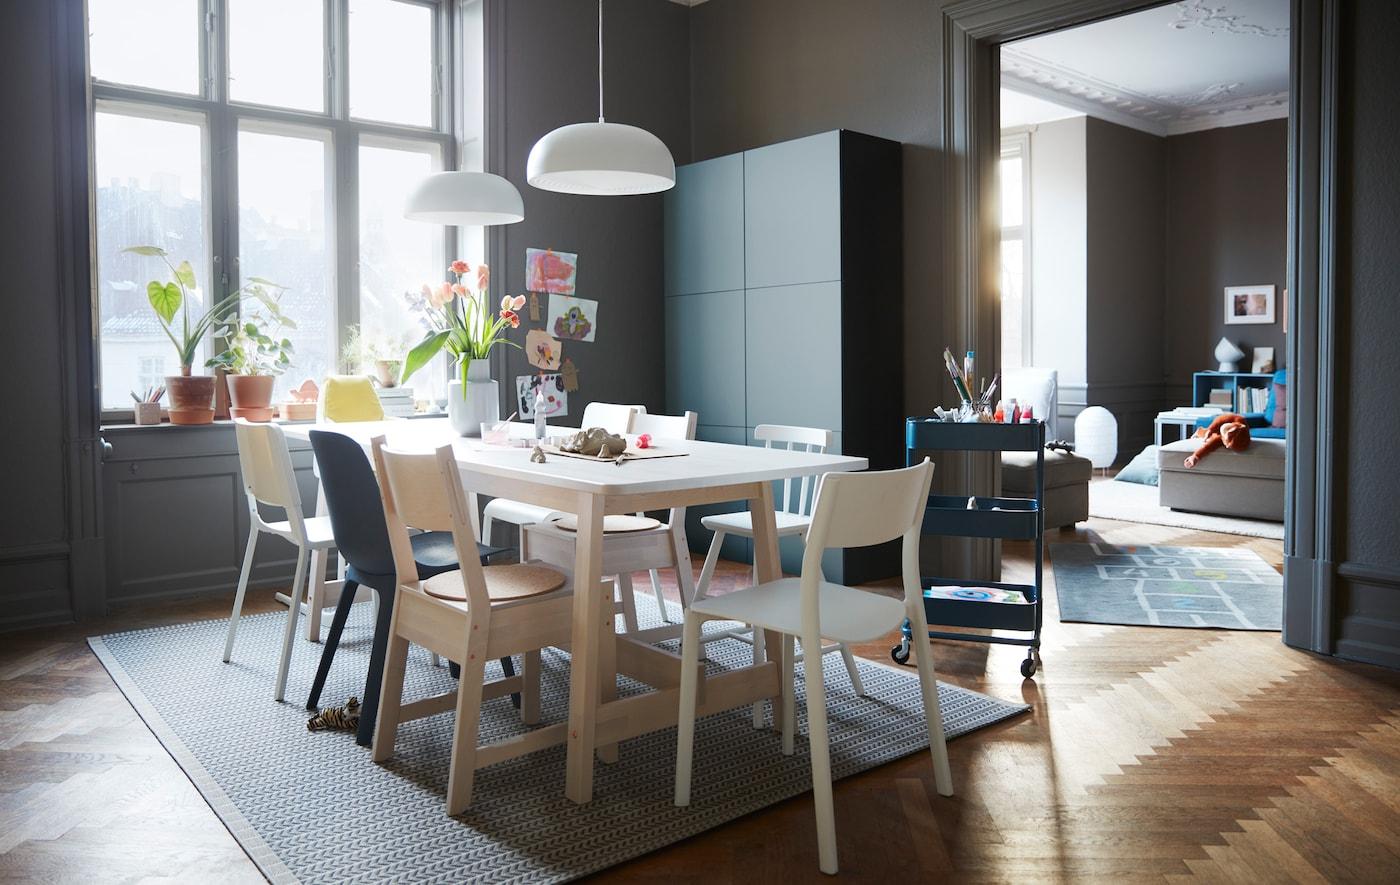 Picture of: Et Komfortabelt Familierum Der Fungerer For Alle Ikea